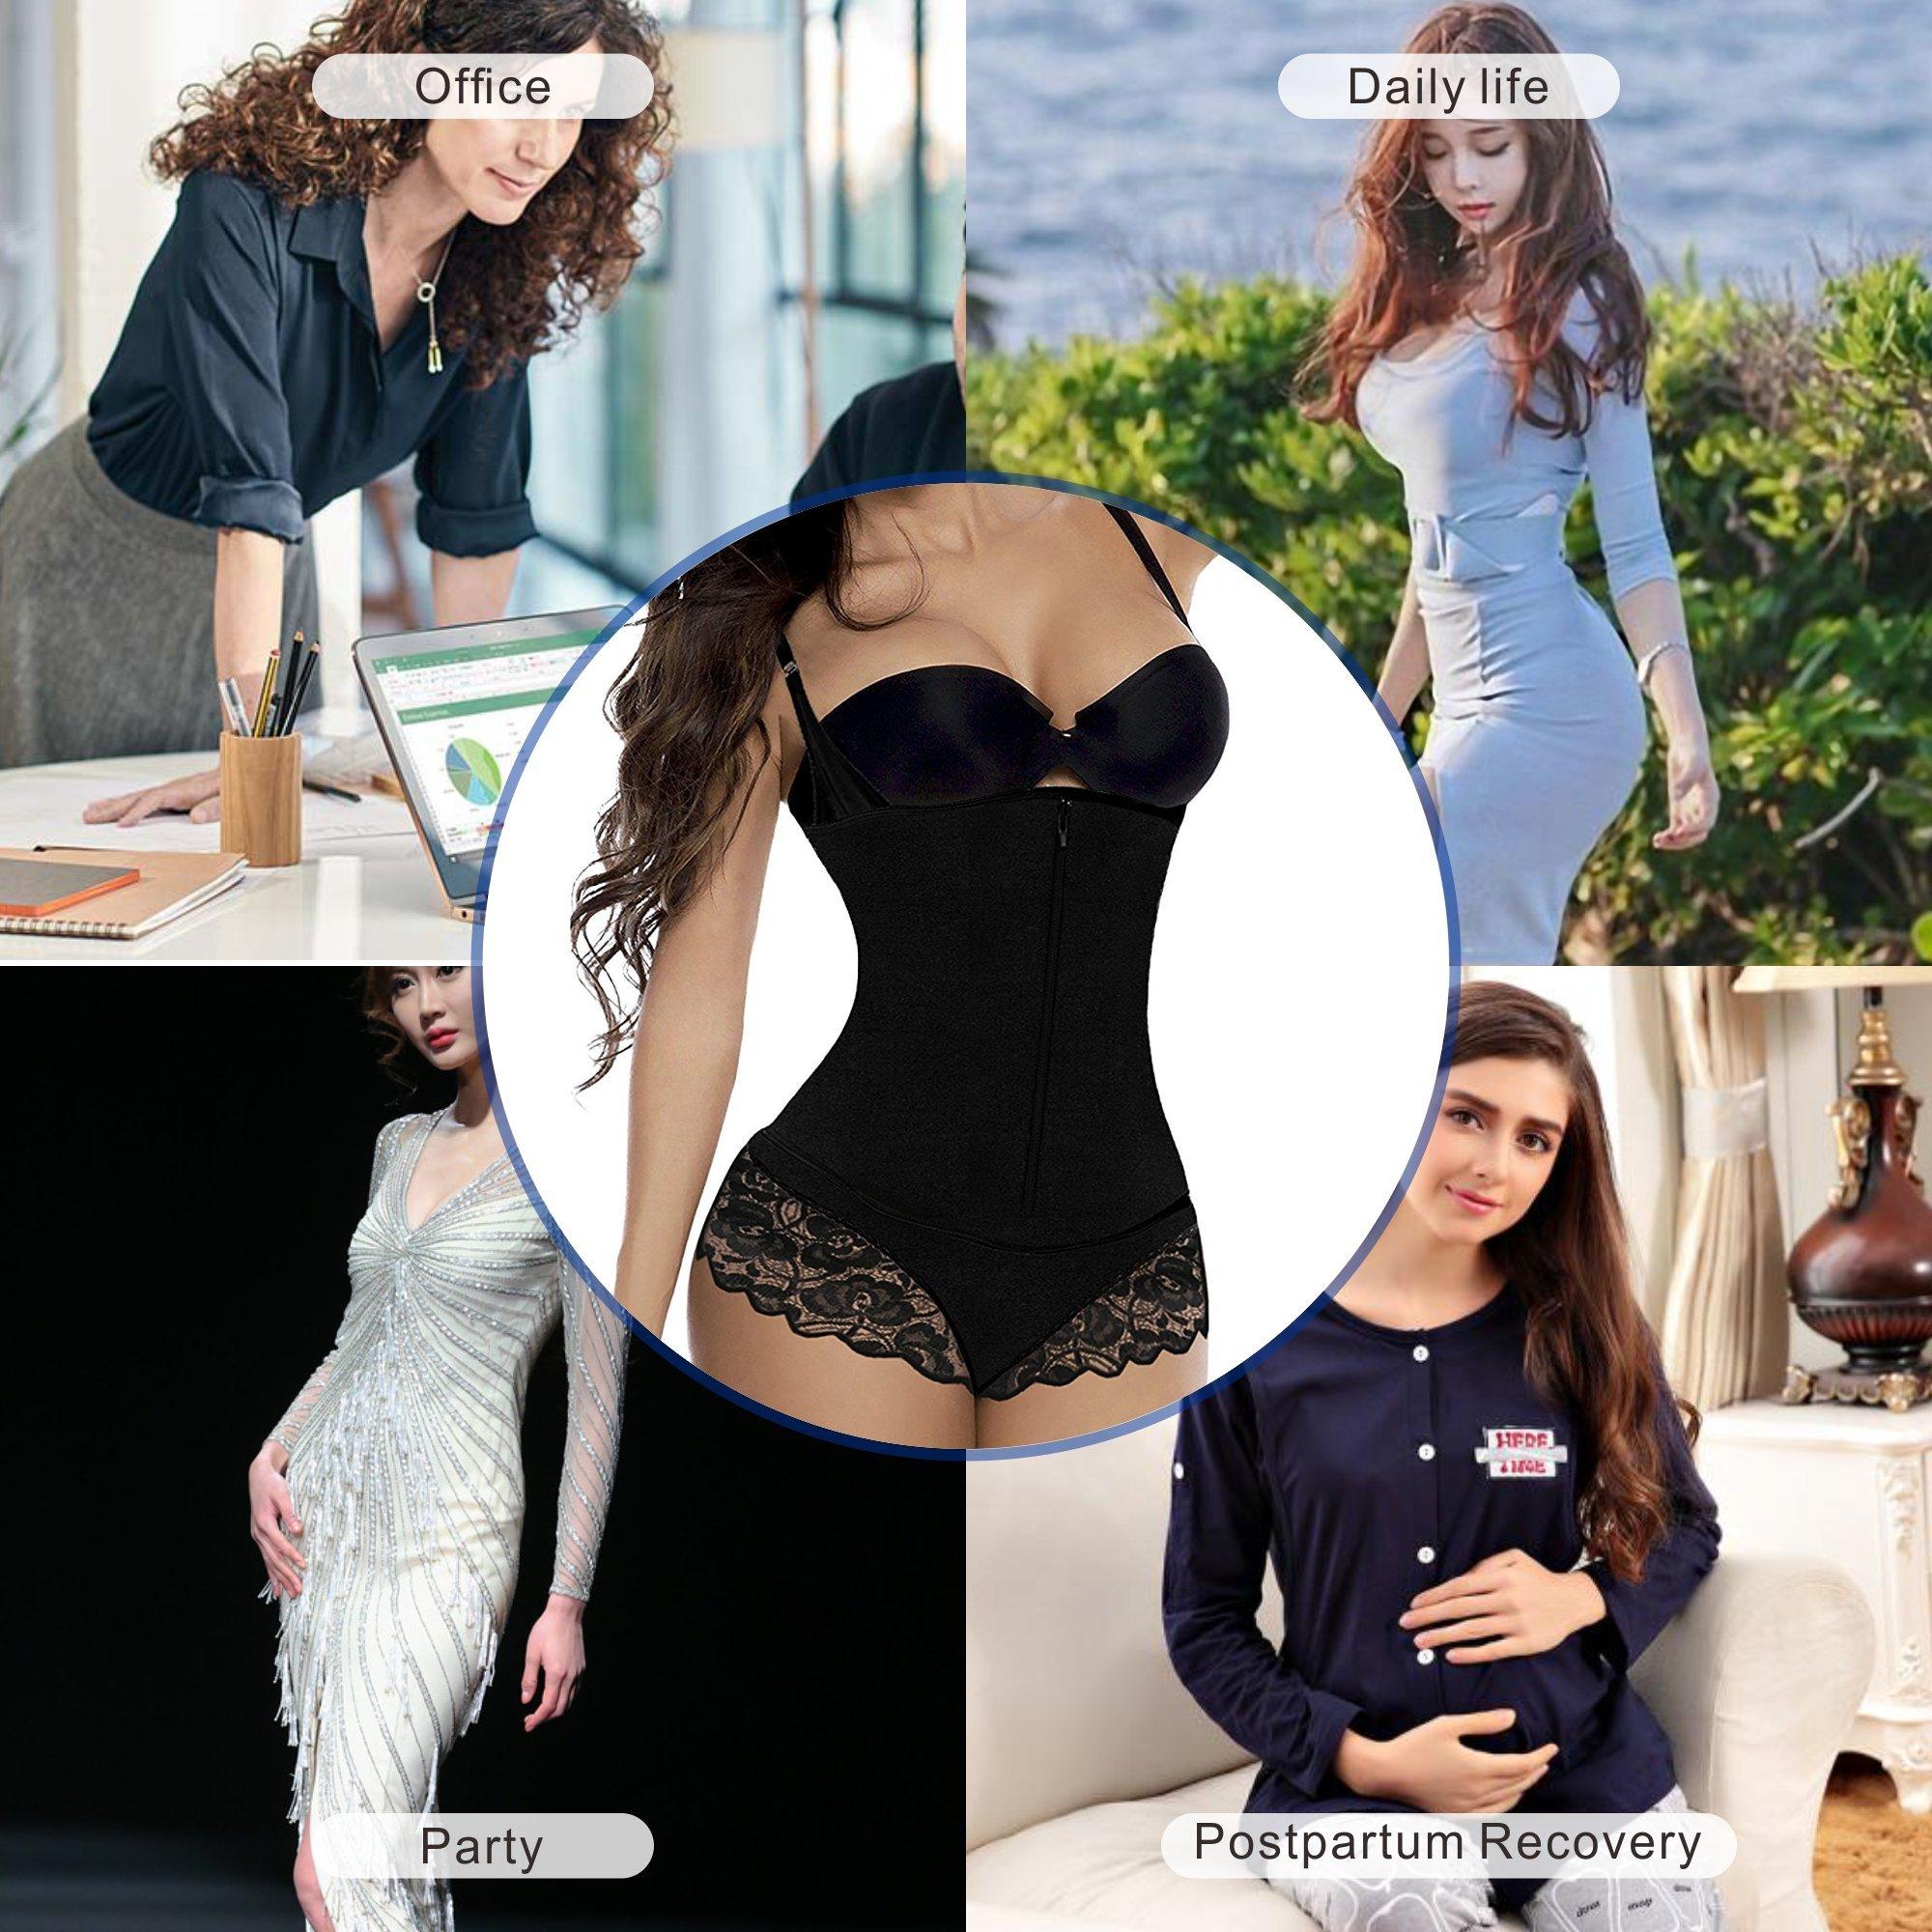 bde2c5fece SHAPERX Camellias Womens Faja Full Body Shaper Open Bust Firm Control  Bodysuit Shapewear with Lace Thong and Zipper